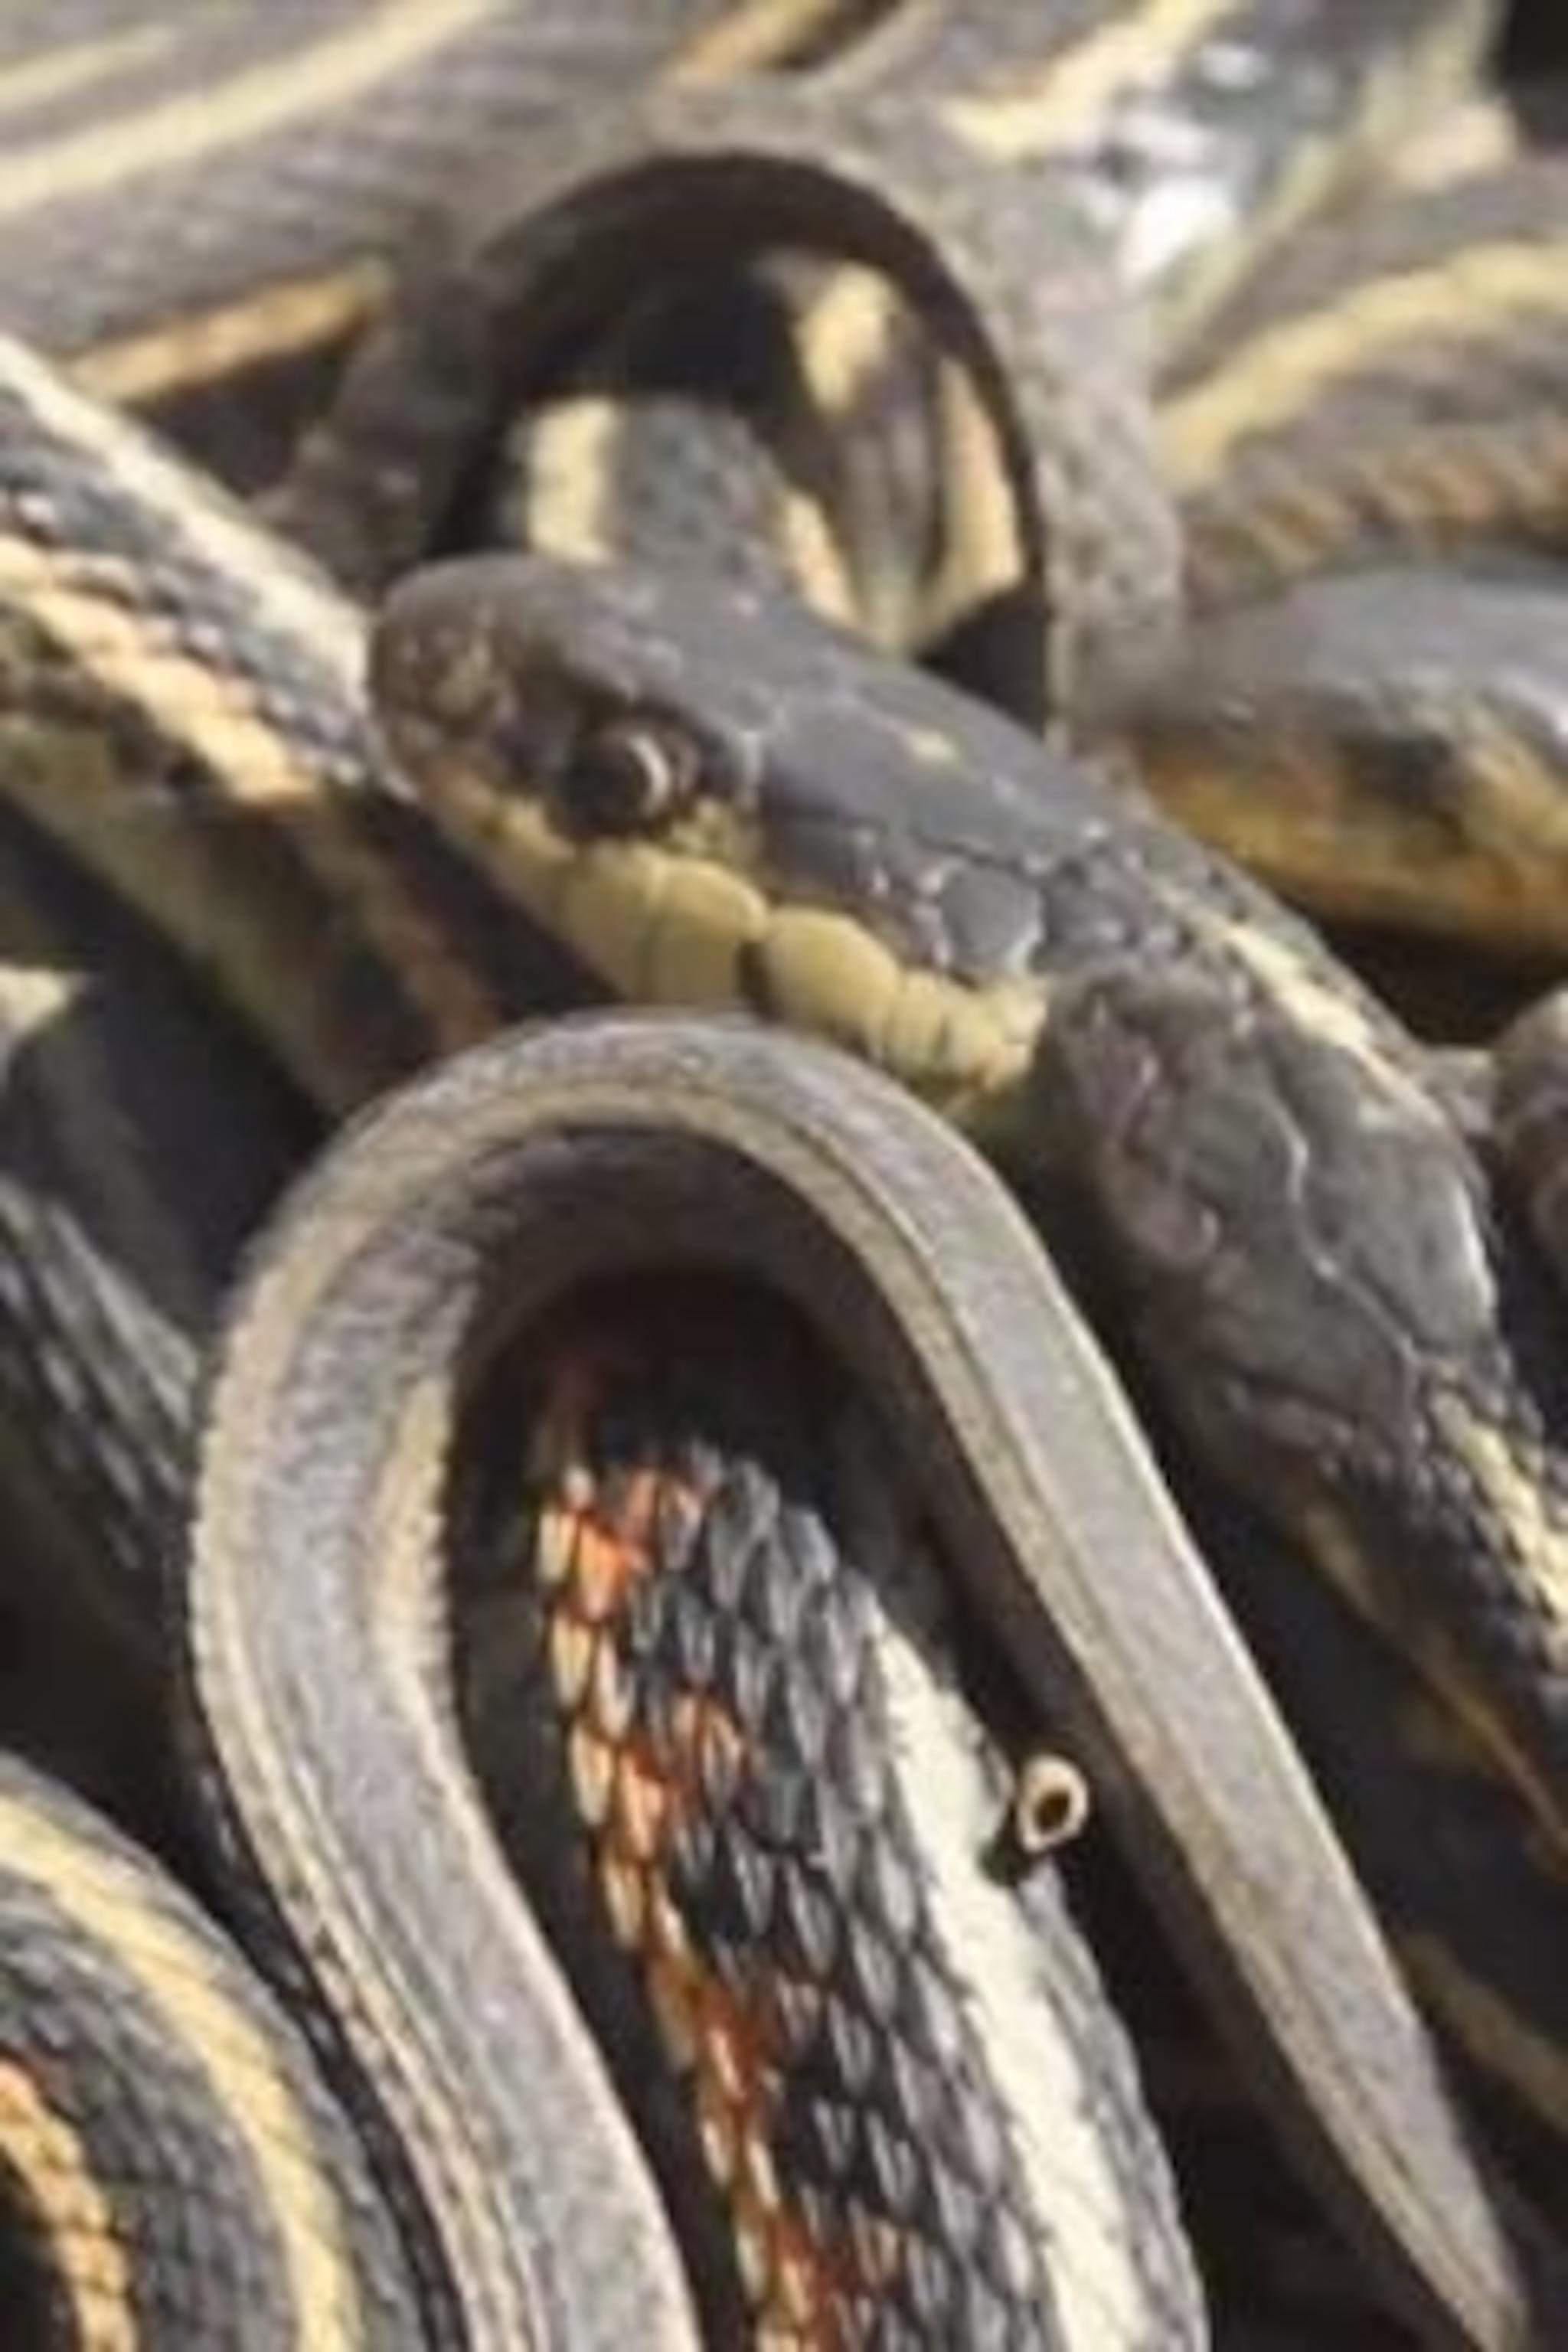 Her vagina in snake Waitress 'caught